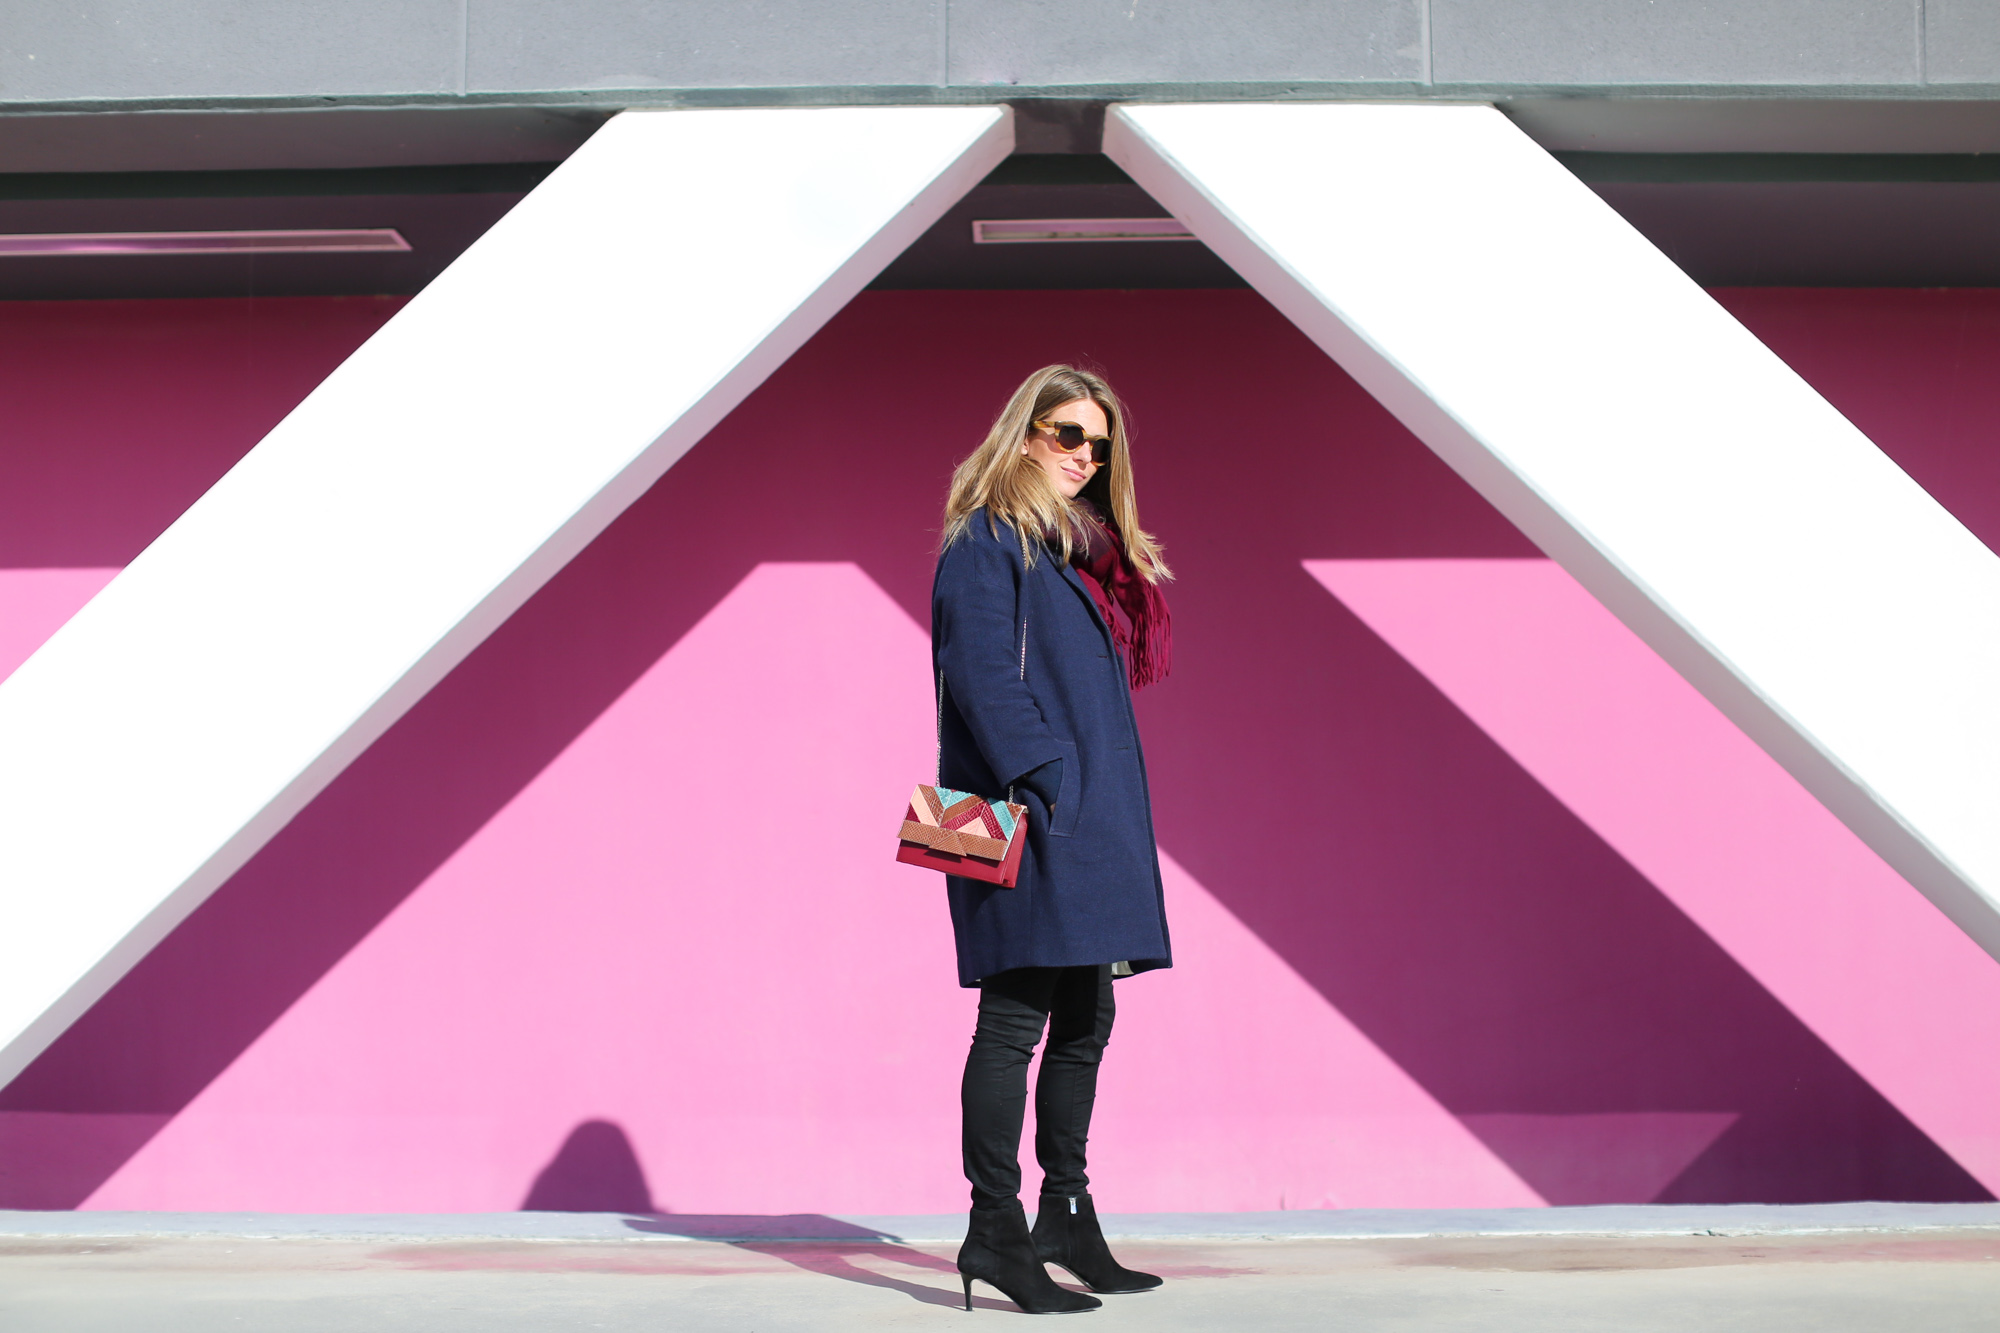 Clochet_fashionblogger_streetstyle_&otherstories_stilettoankleboots_burgundyheroscarf_metallicflowerssweater_titamadridspiga-3